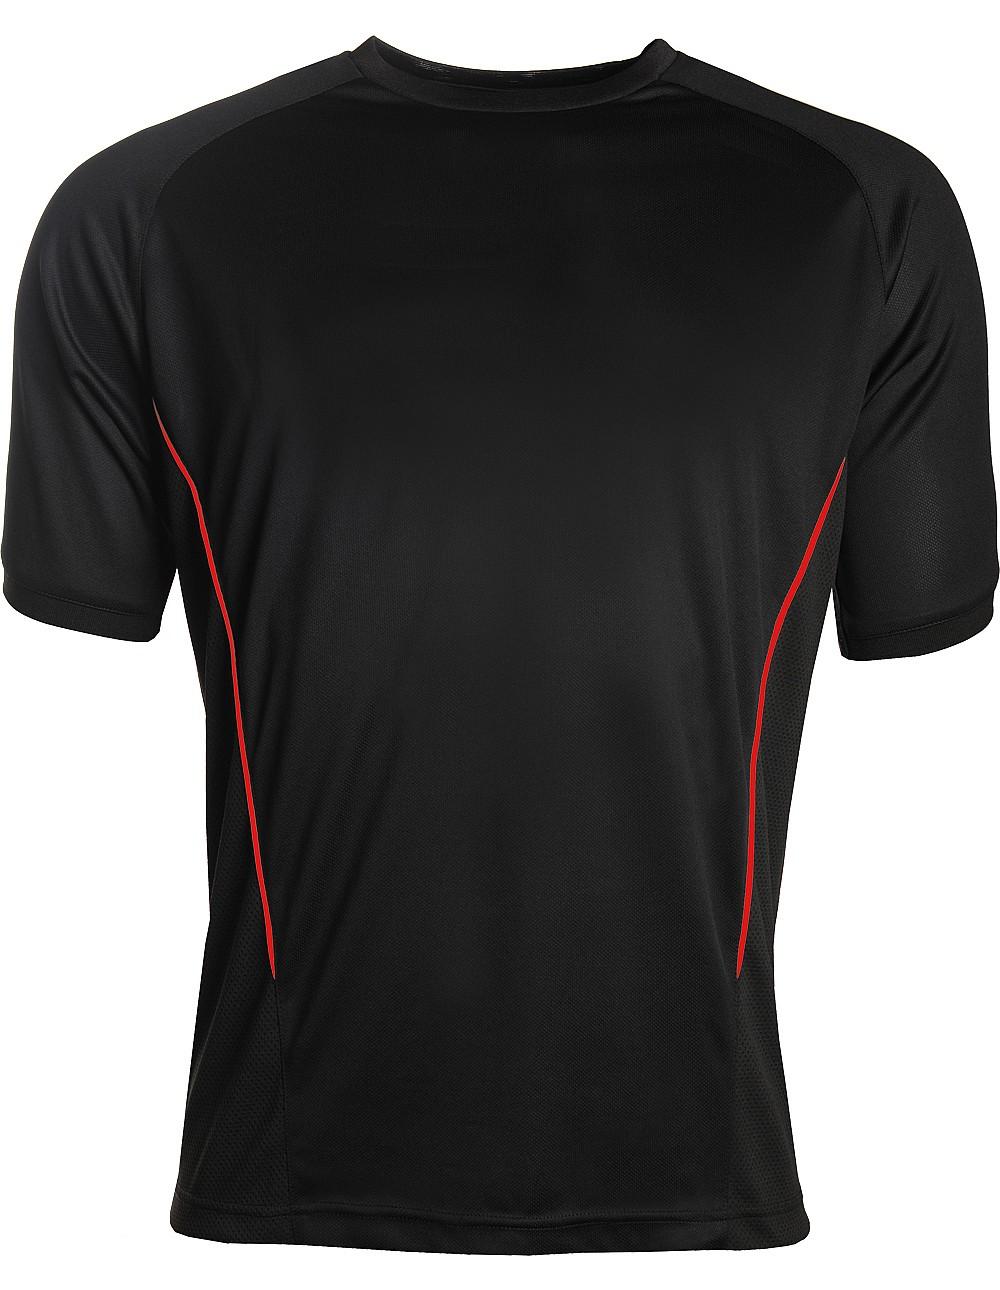 Aptus black red Training top